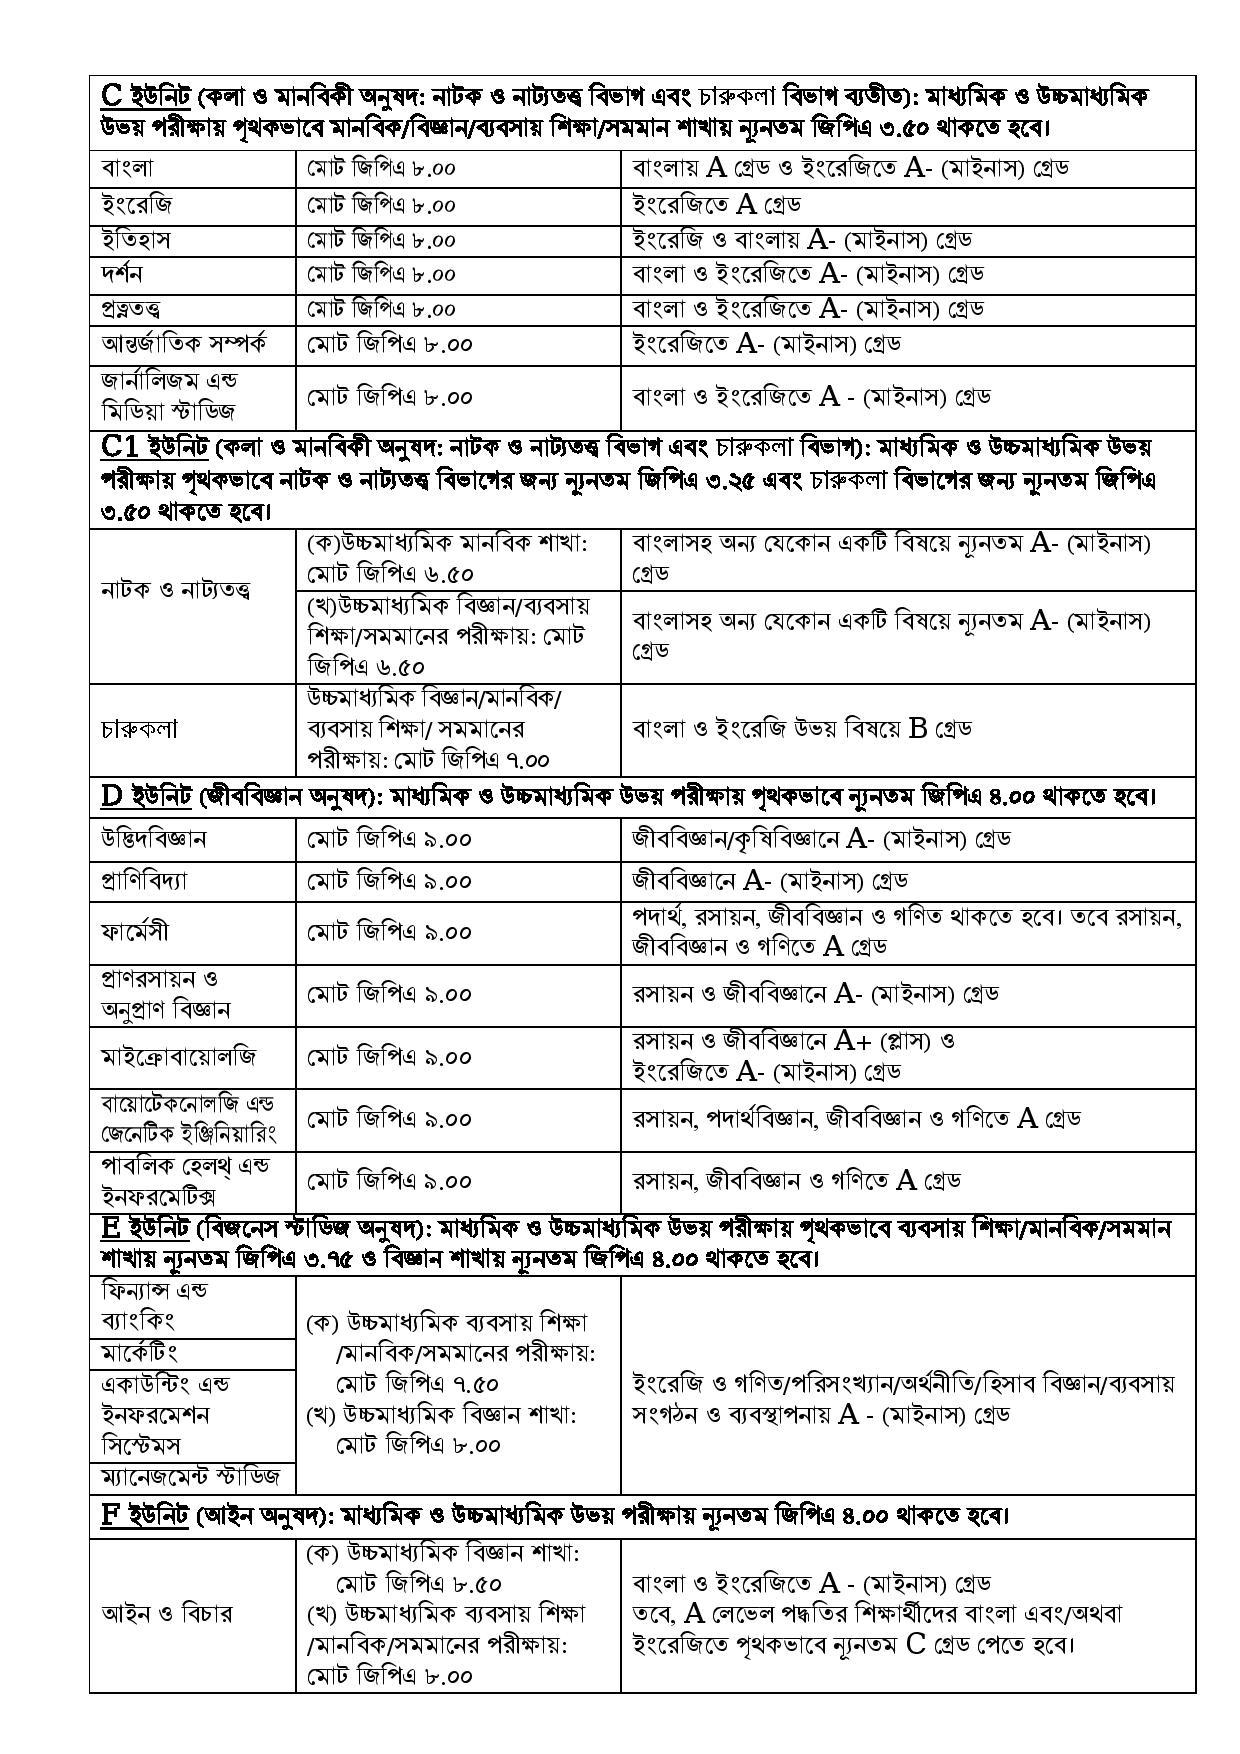 JU-Admission-2020-21-page-002